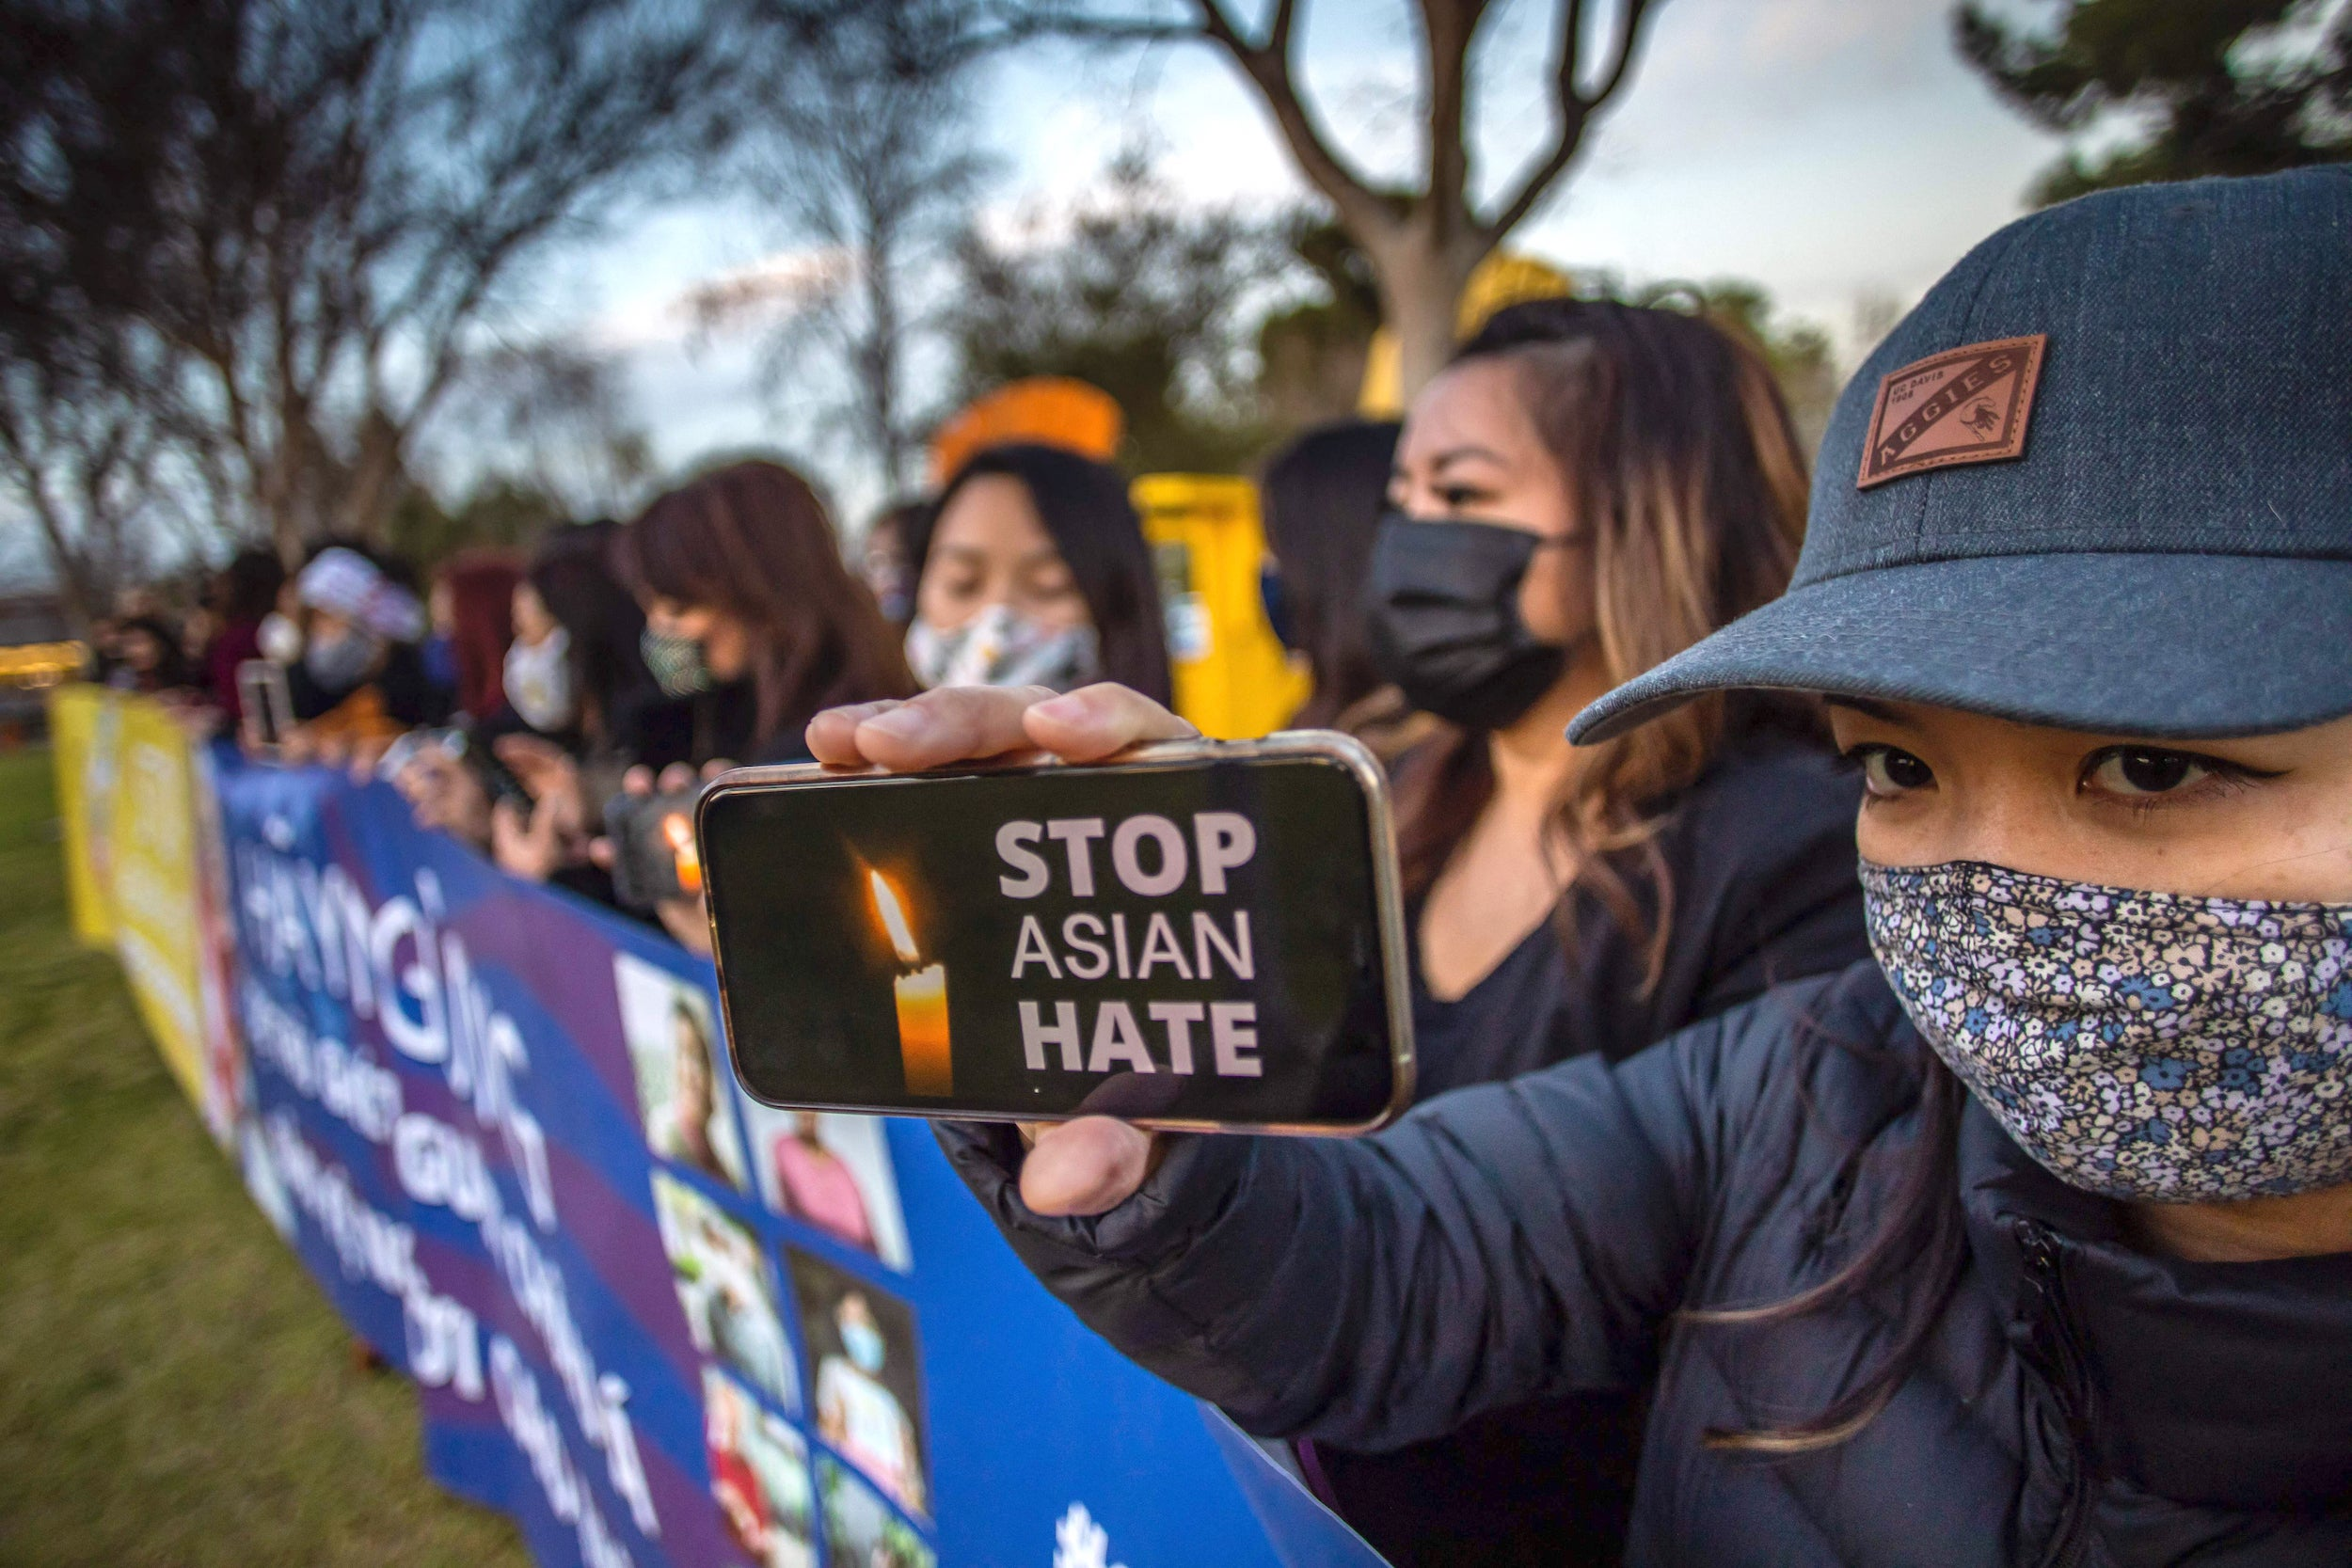 Hate women women asian To Combat